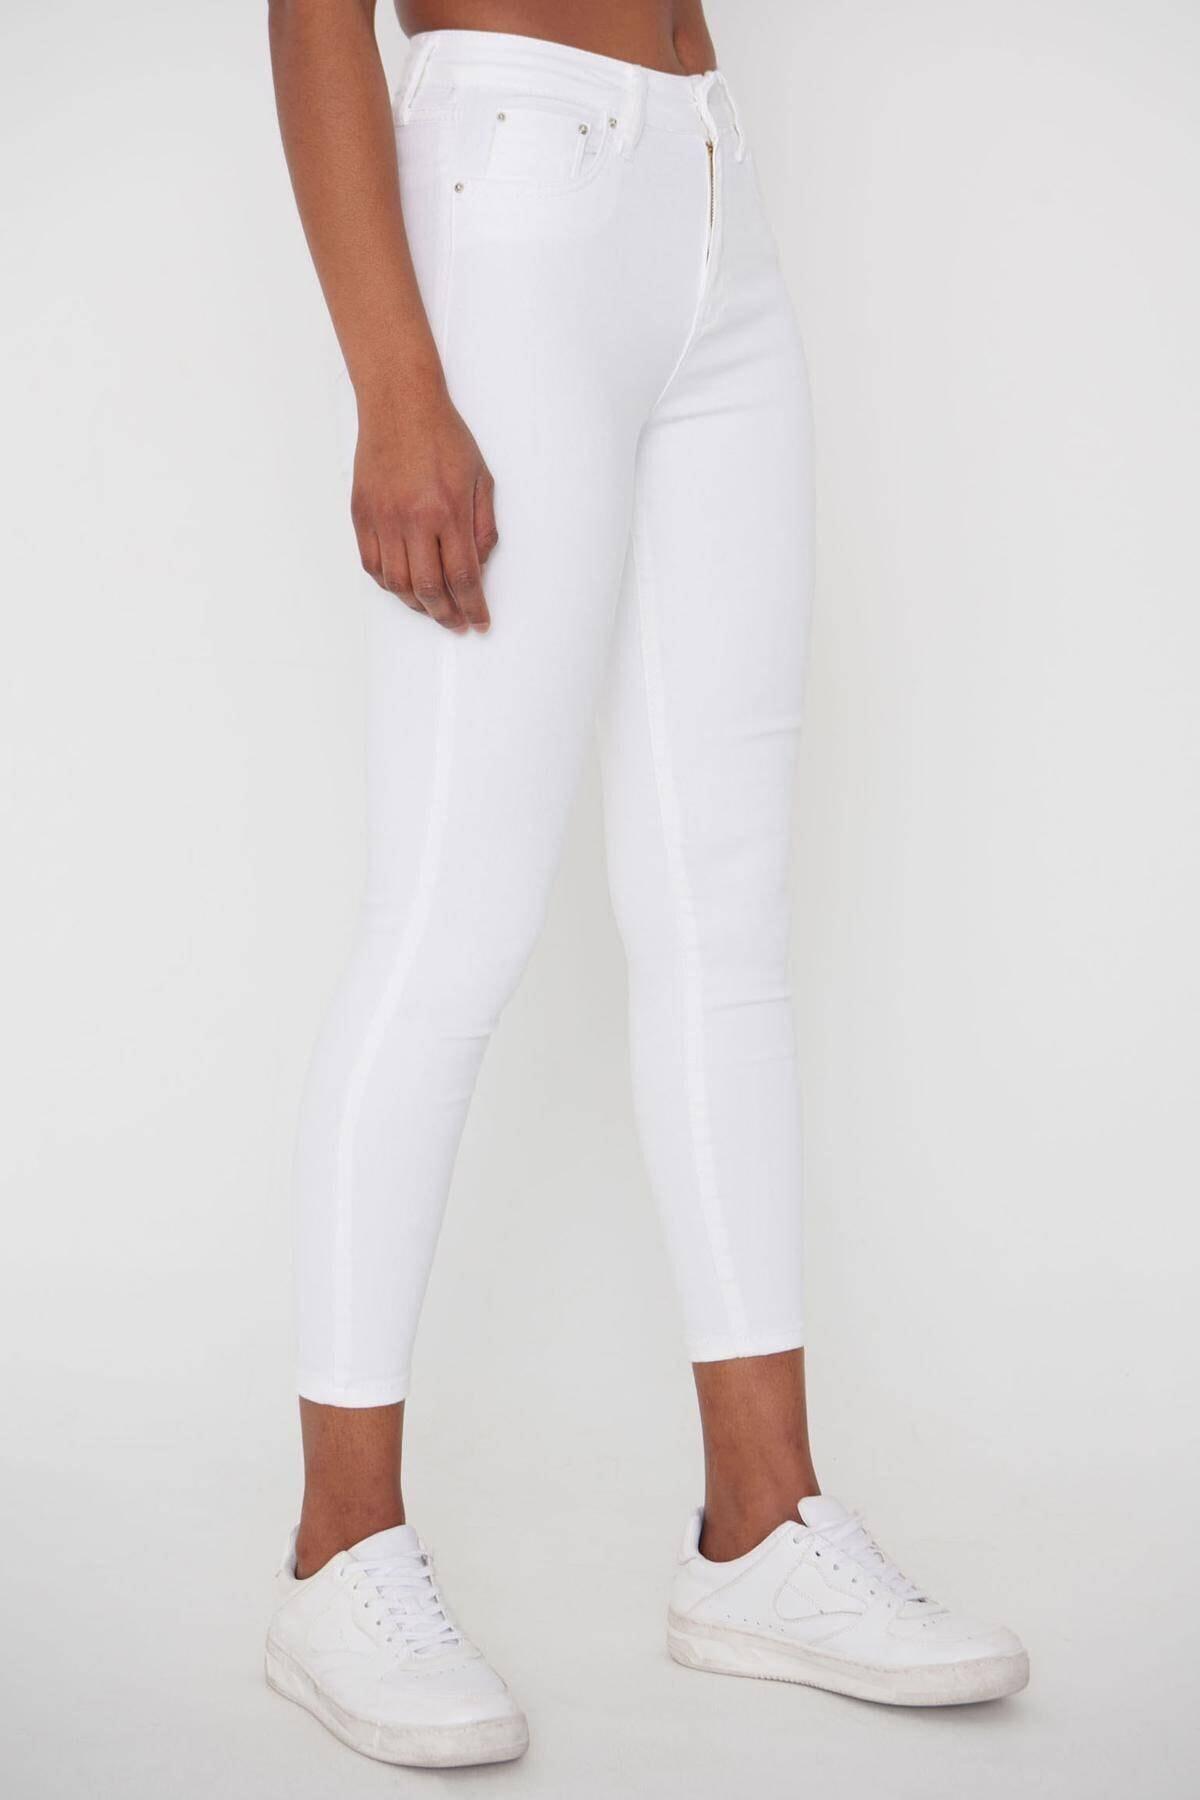 Addax Kadın Beyaz Pantolon Pn4424 - Pnj ADX-00008543 2